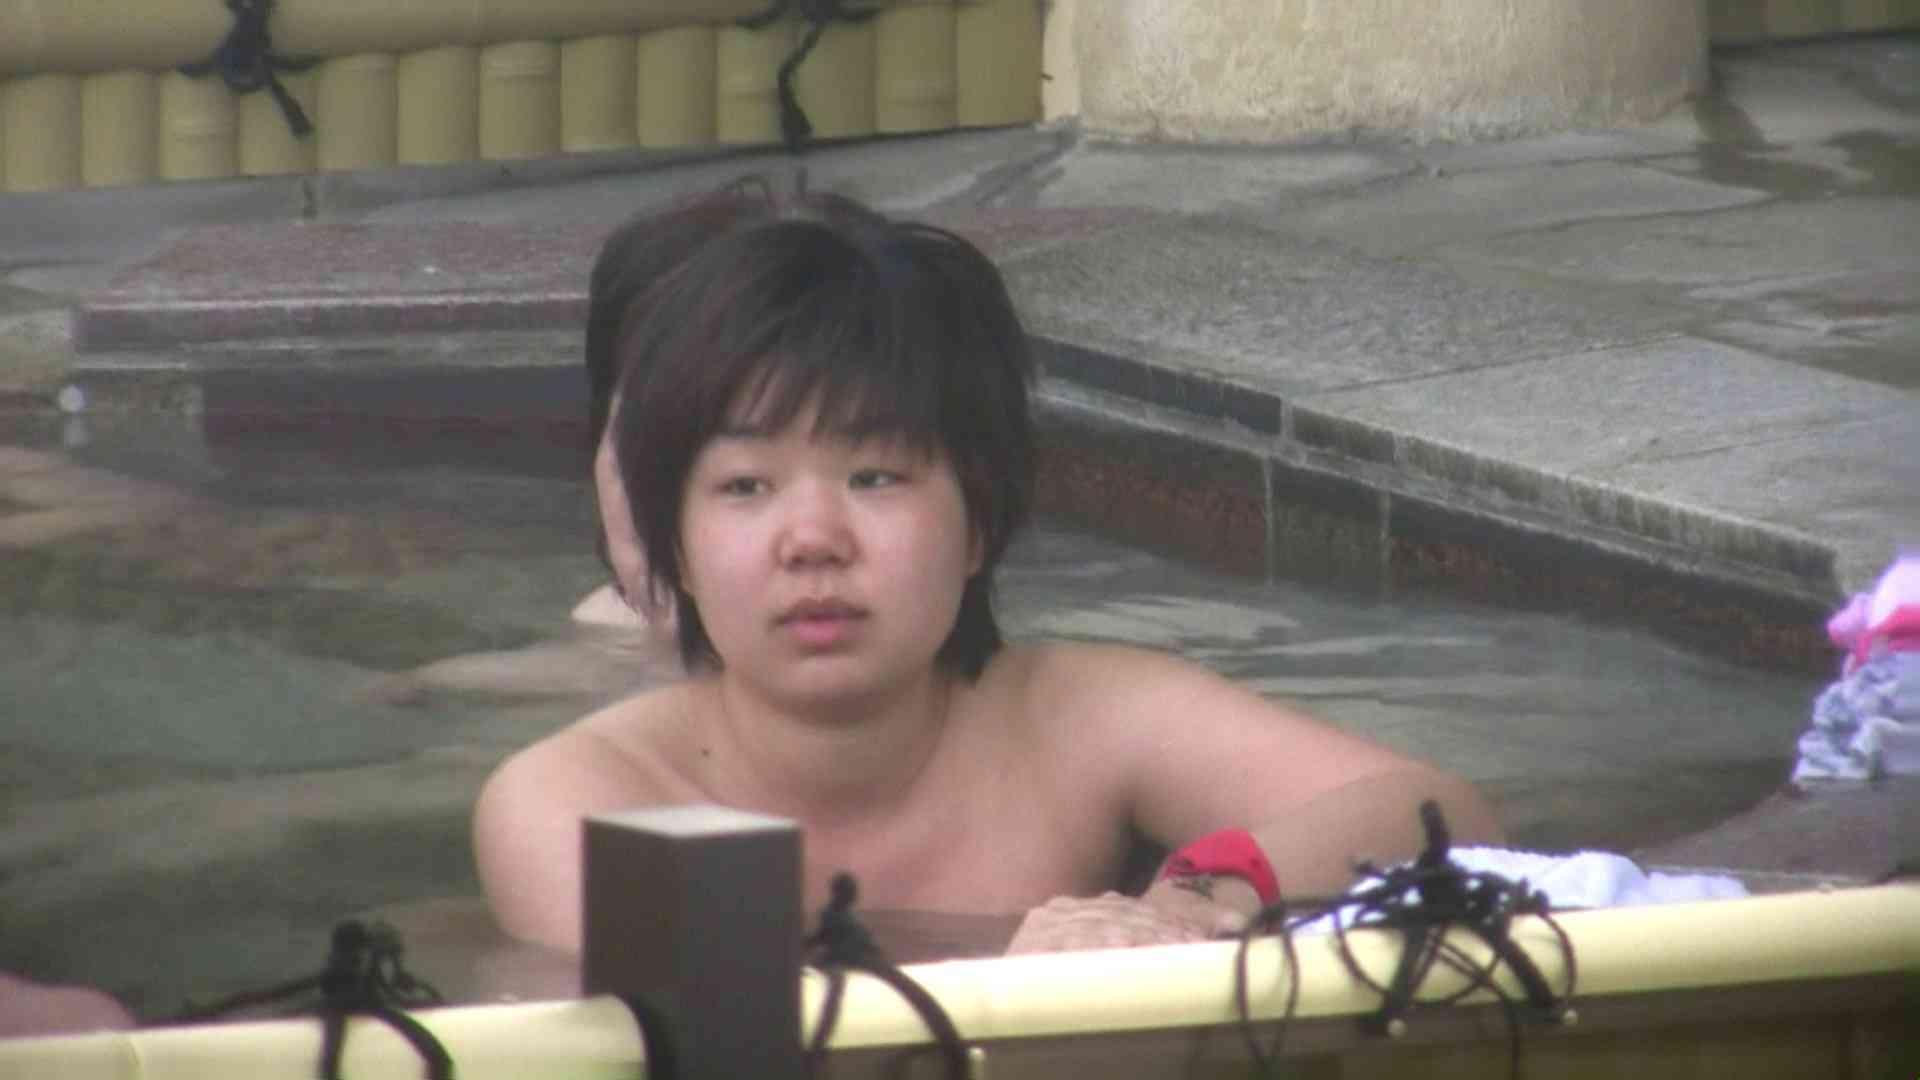 Aquaな露天風呂Vol.53【VIP限定】 盗撮大放出 ヌード画像 68連発 3